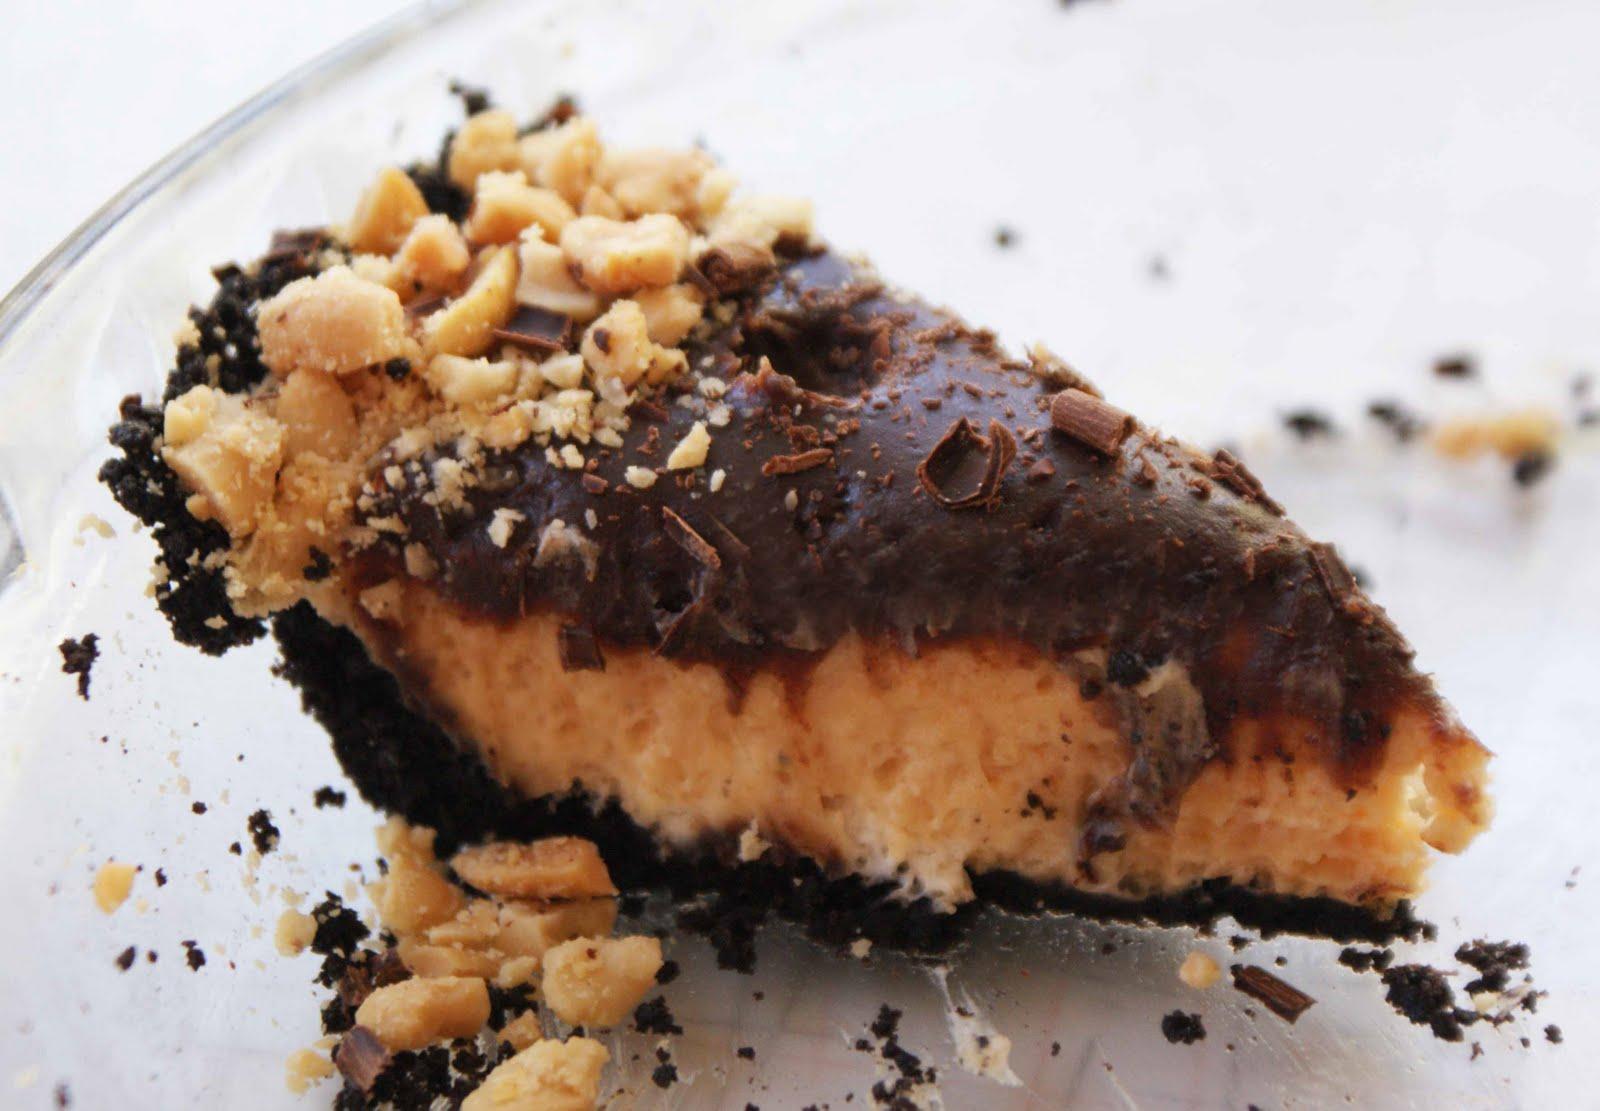 Chocolate Peanut Butter Pie - Sex Porn Images